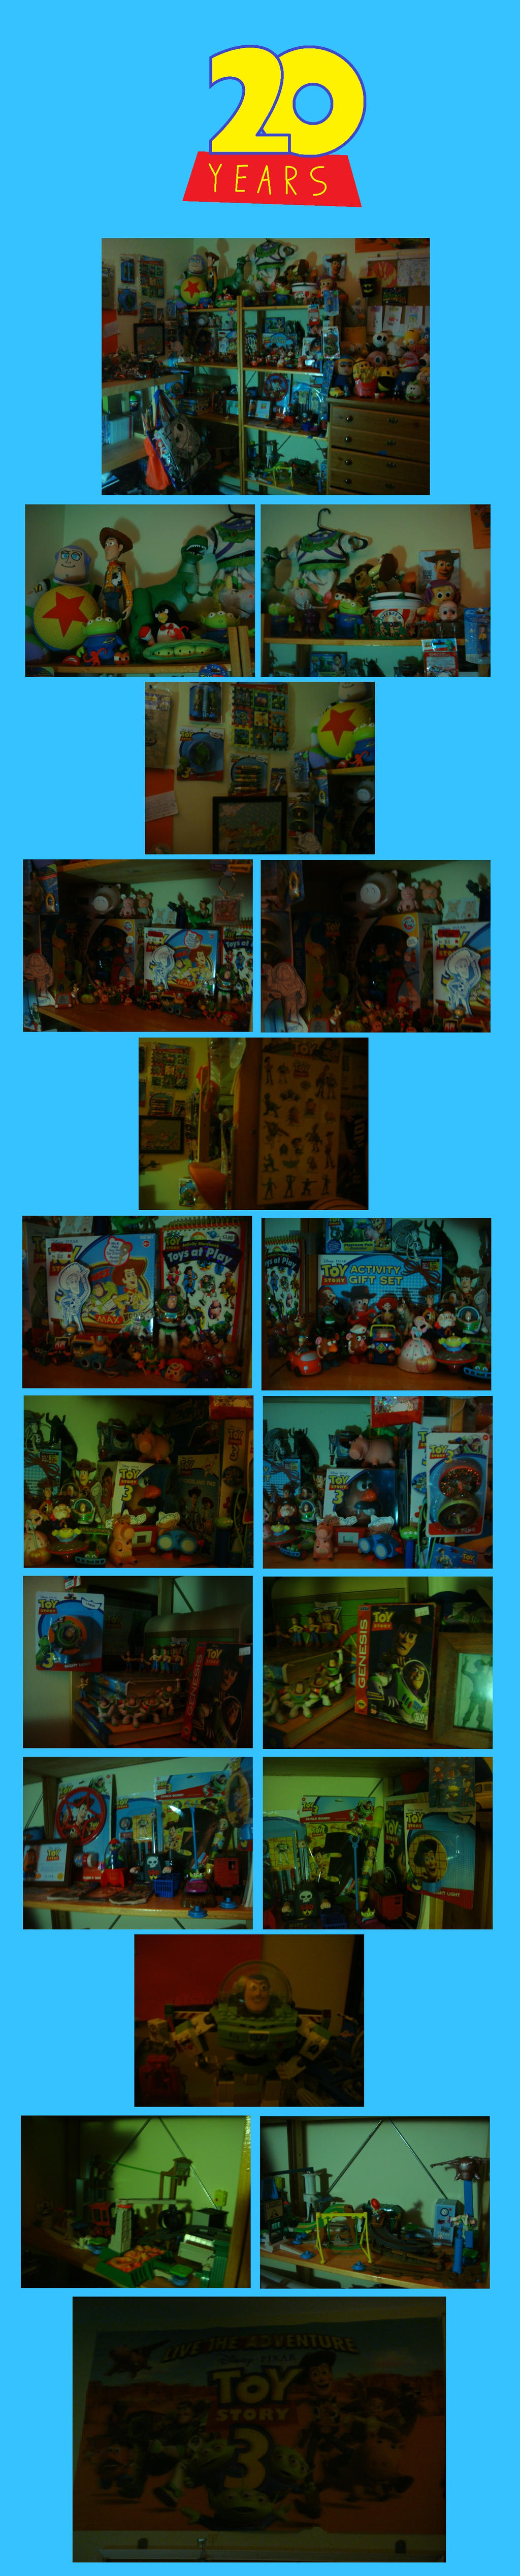 My Toy Story Collection by thecrazyworldofjack